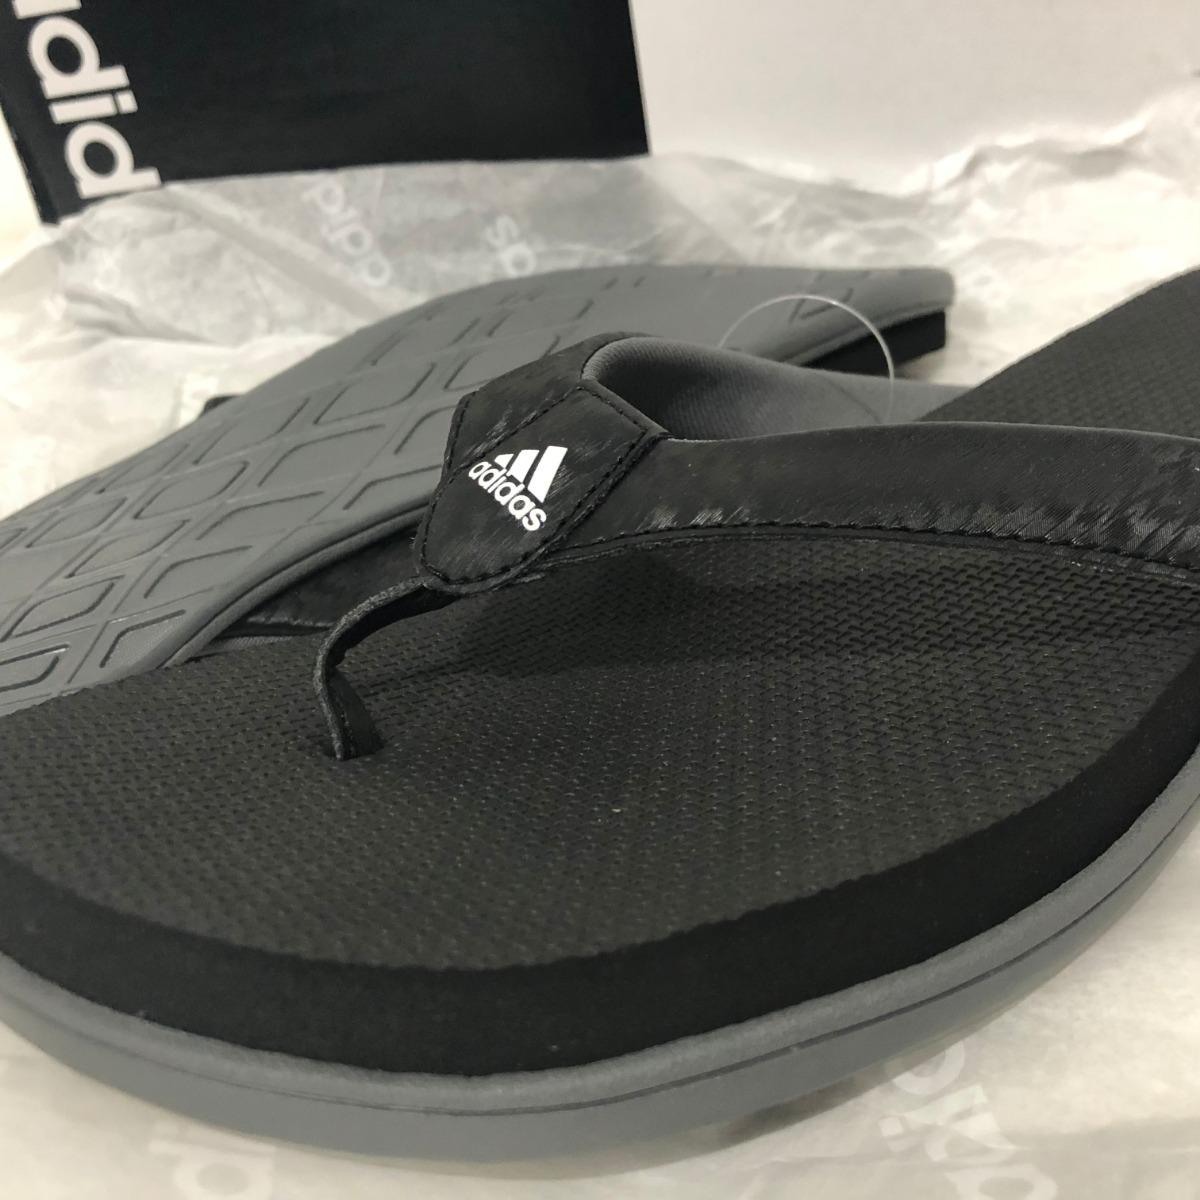 dc50e17a7d629 sandalias adidas cloudfoam talla 29 mex 11 amer envio gratis. Cargando zoom.